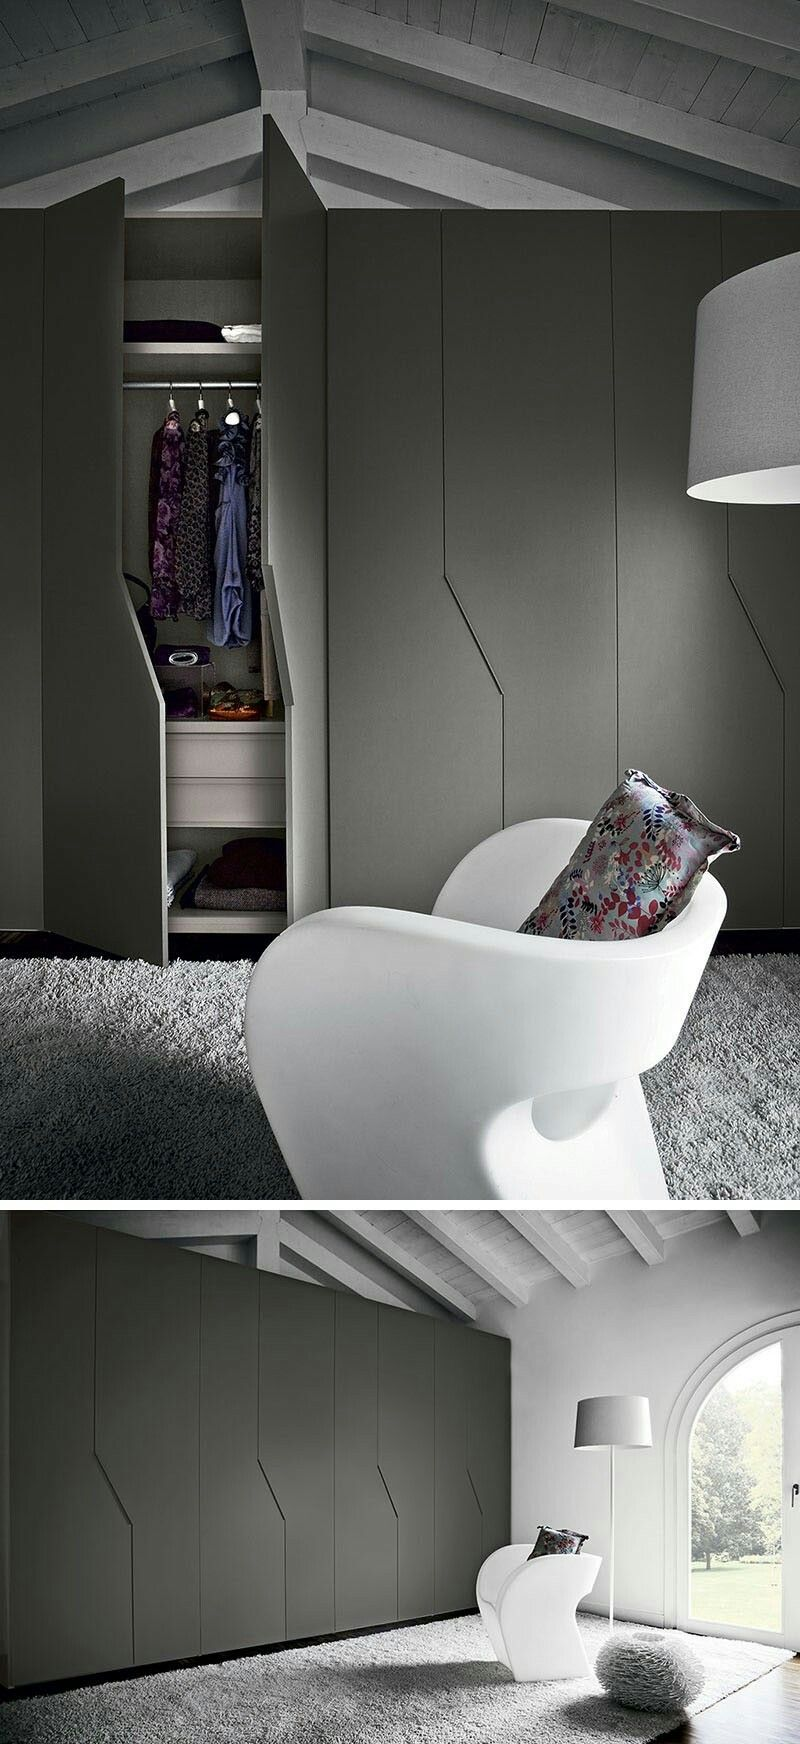 Pin By Manas Jain On Contemporary Furniture Pinterest  # Muebles Kasa Design